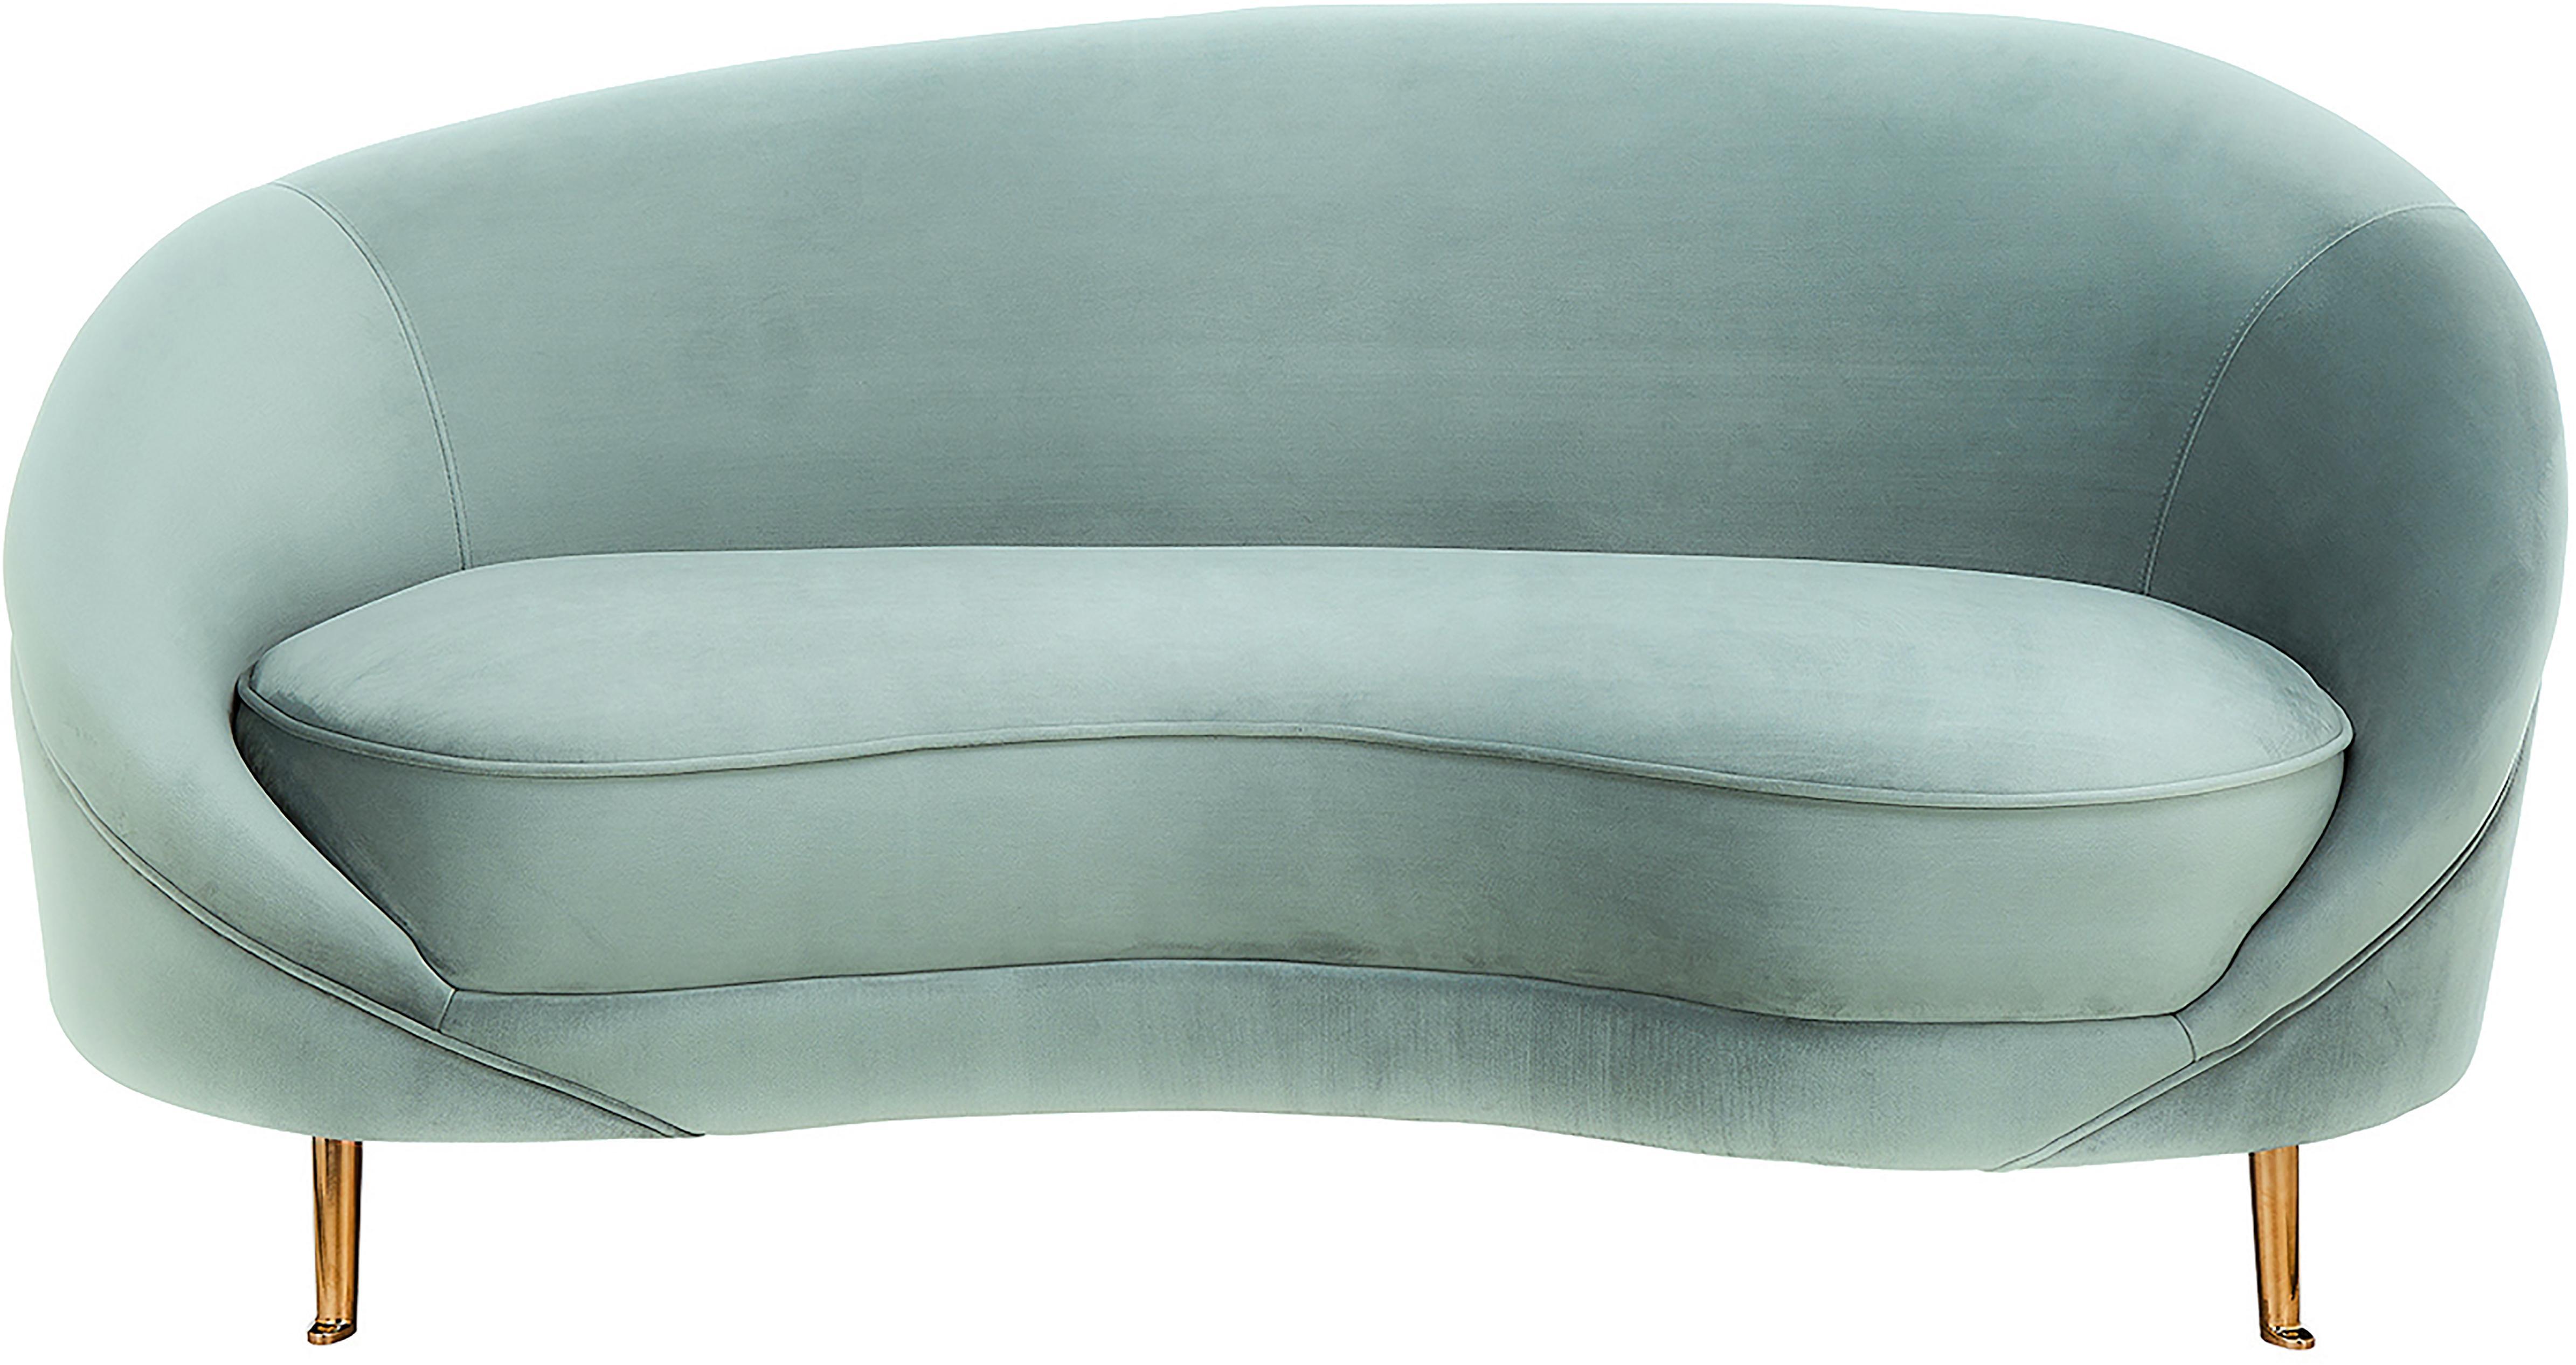 Samt-Nierensofa Gatsby (2-Sitzer), Bezug: Samt (Polyester) 25.000 S, Gestell: Massives Eukalyptusholz, Samt Türkis, B 173 x T 87 cm